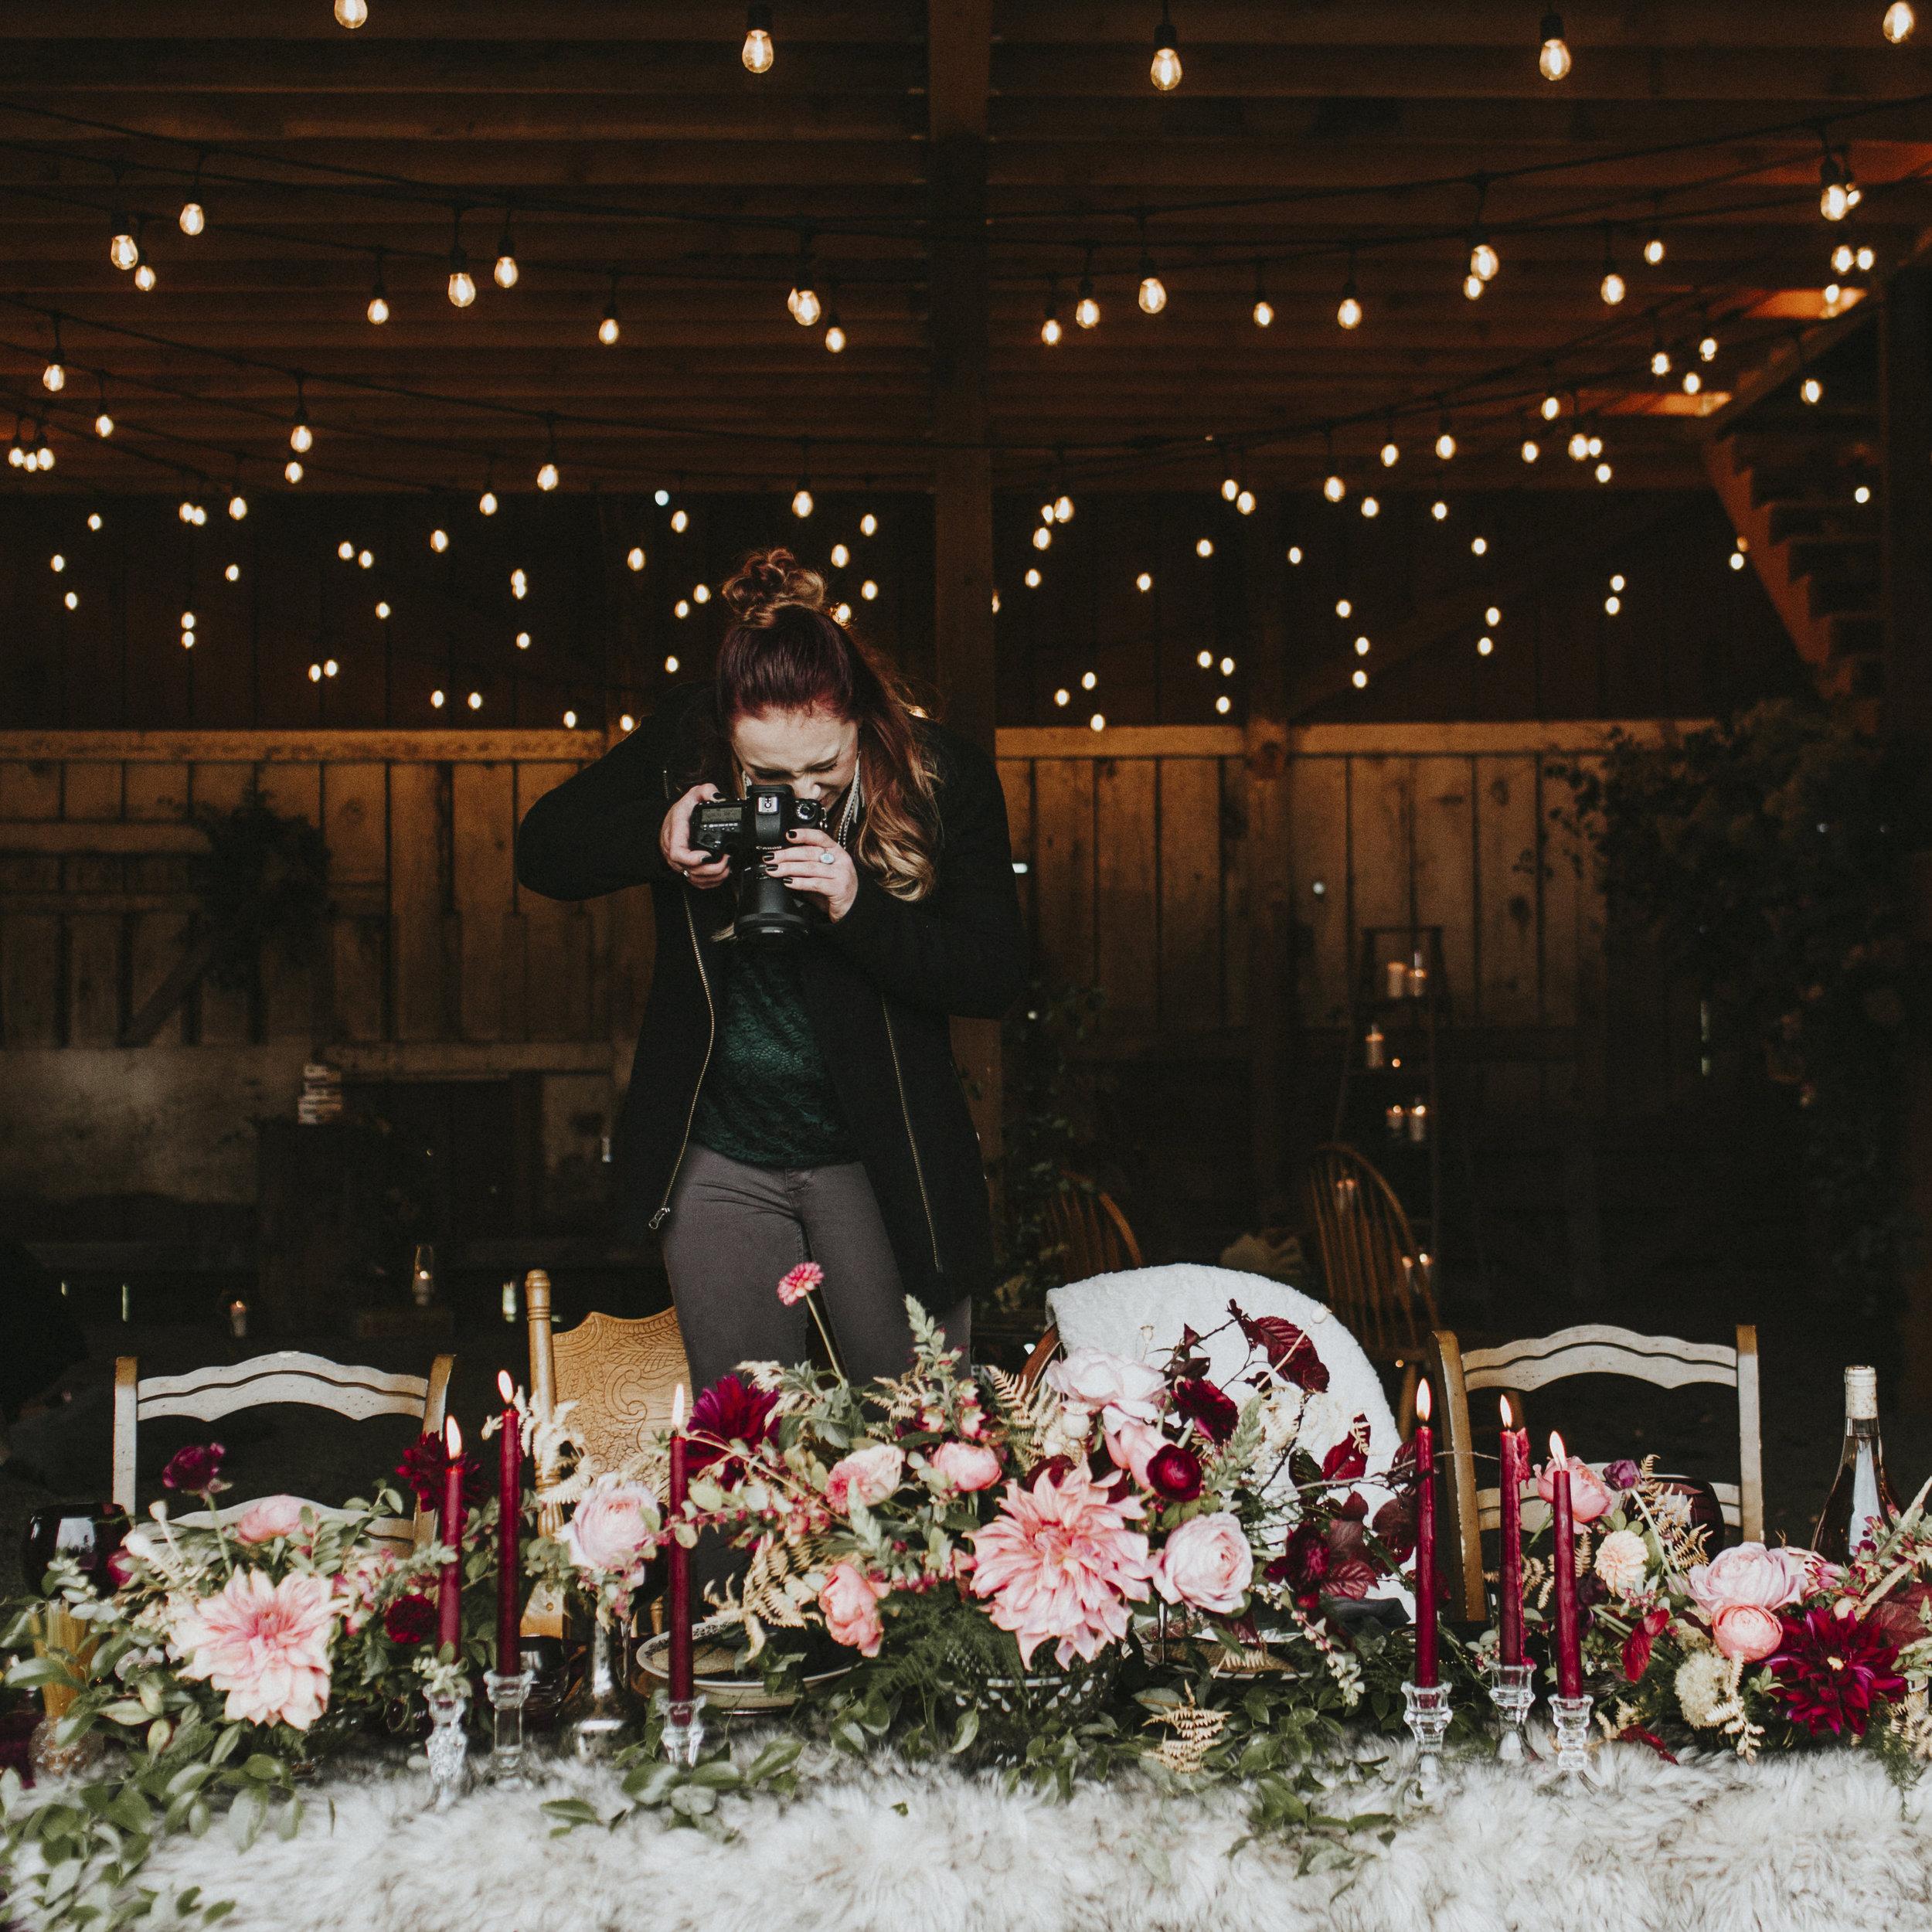 PNW elopement wedding photographer | Bri Bergman Photography